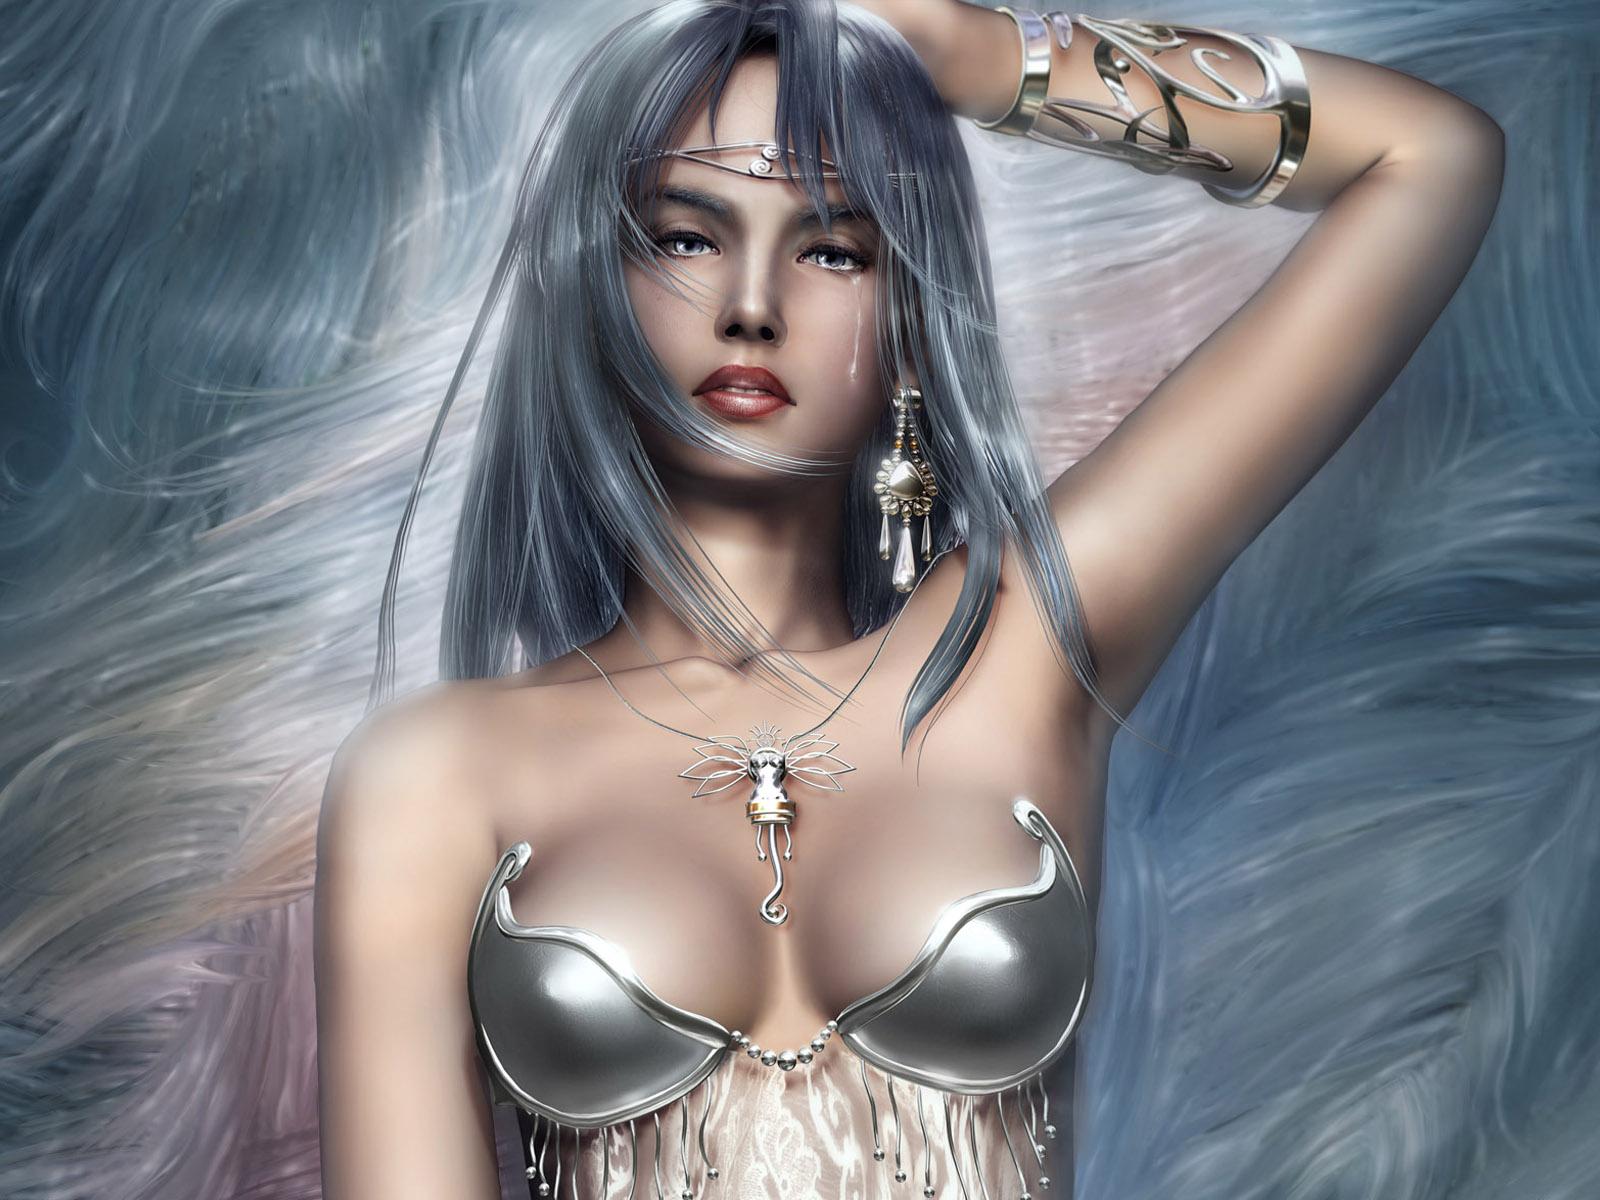 fantasy sexy hot woman